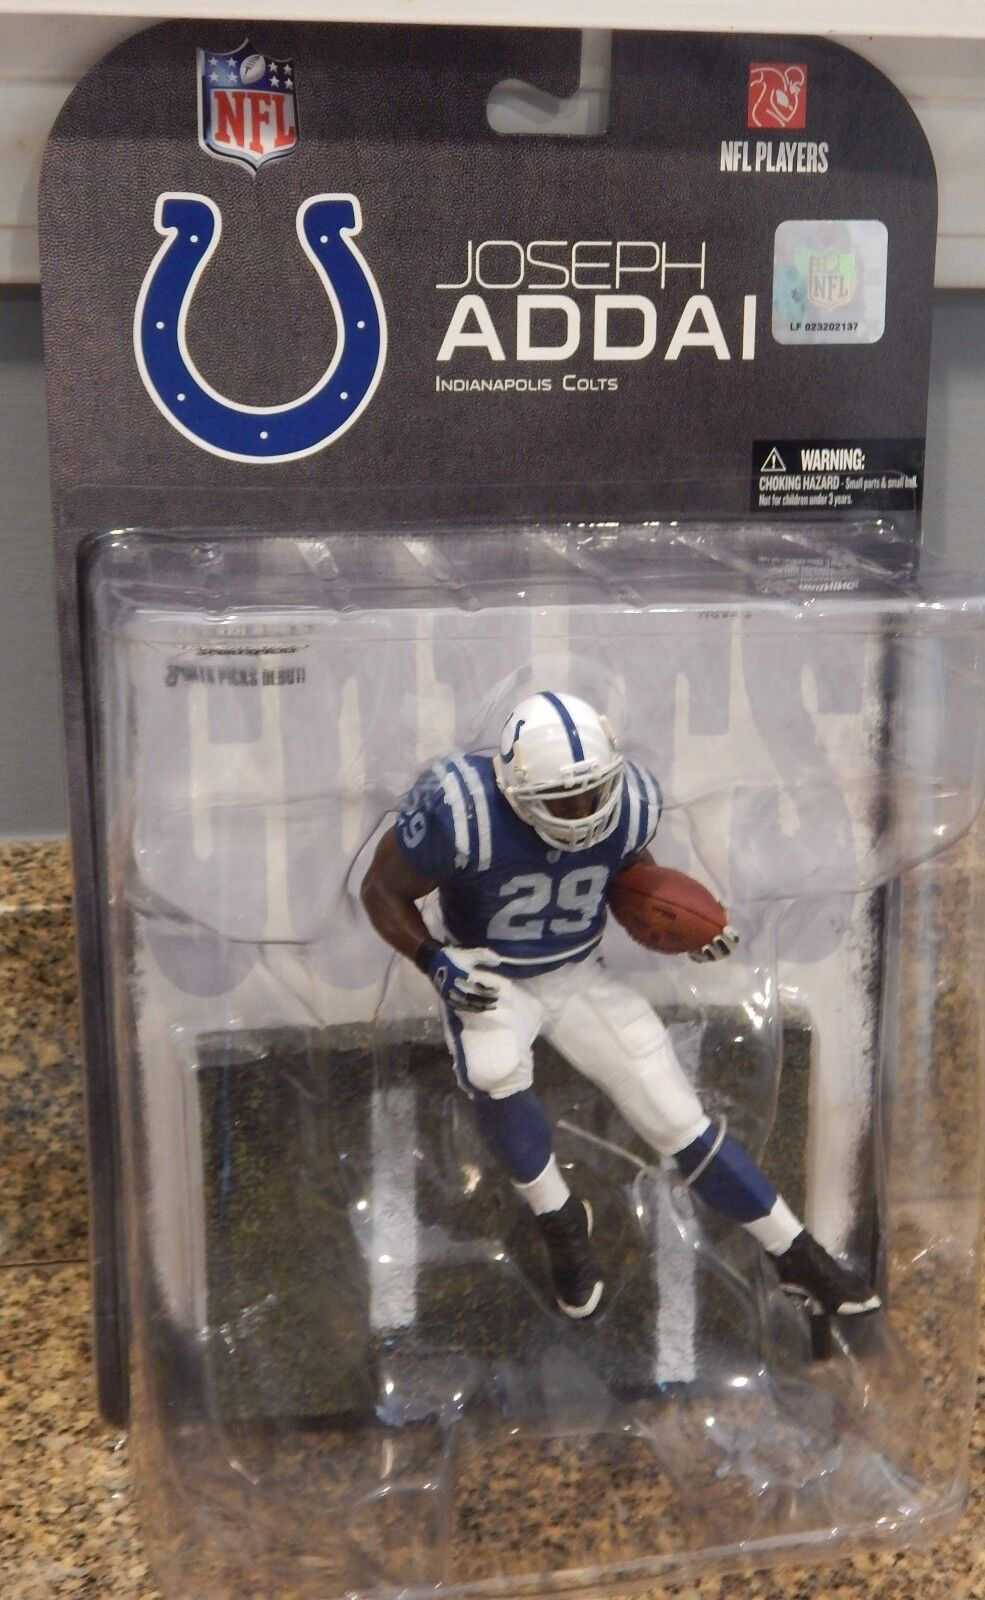 NEW 2008 McFarlane NFL Joseph Addai #29 Indianapolis Colts Series 17 Figure